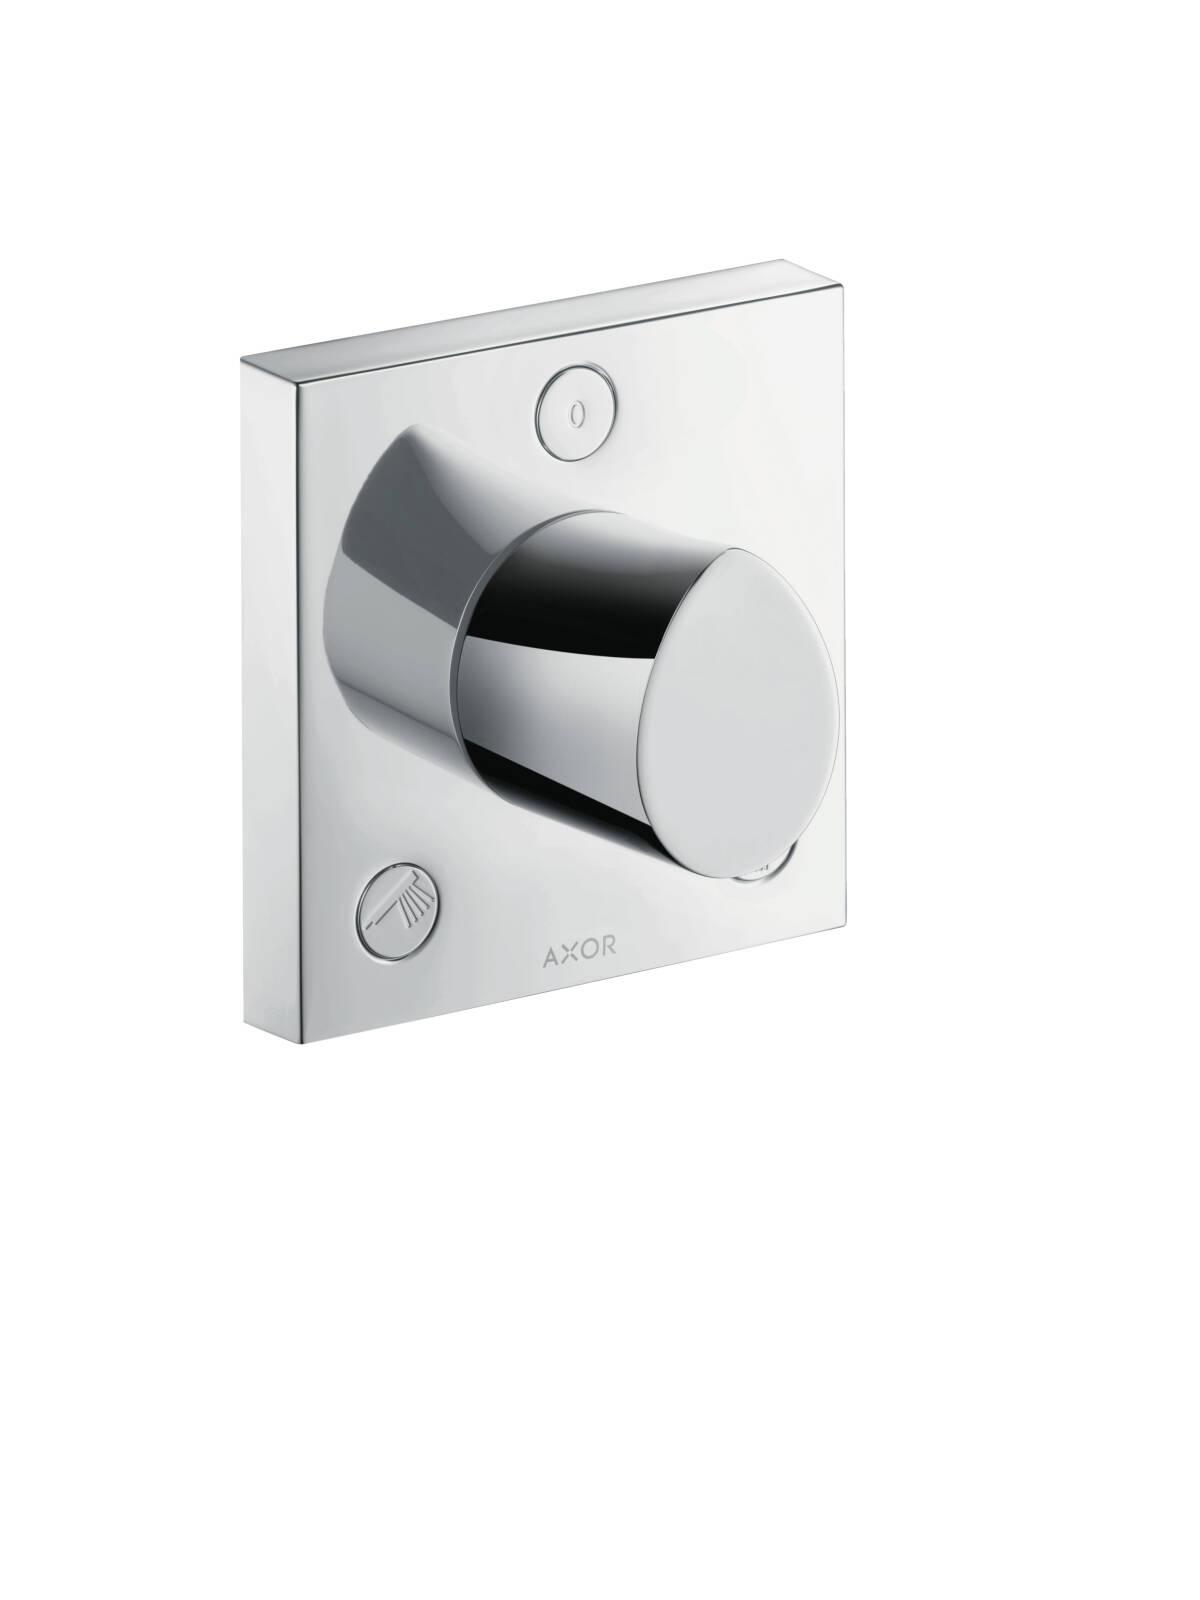 Trio/ Quattro shut-off/ diverter valve 120/120 for concealed installation, Brushed Black Chrome, 12731340